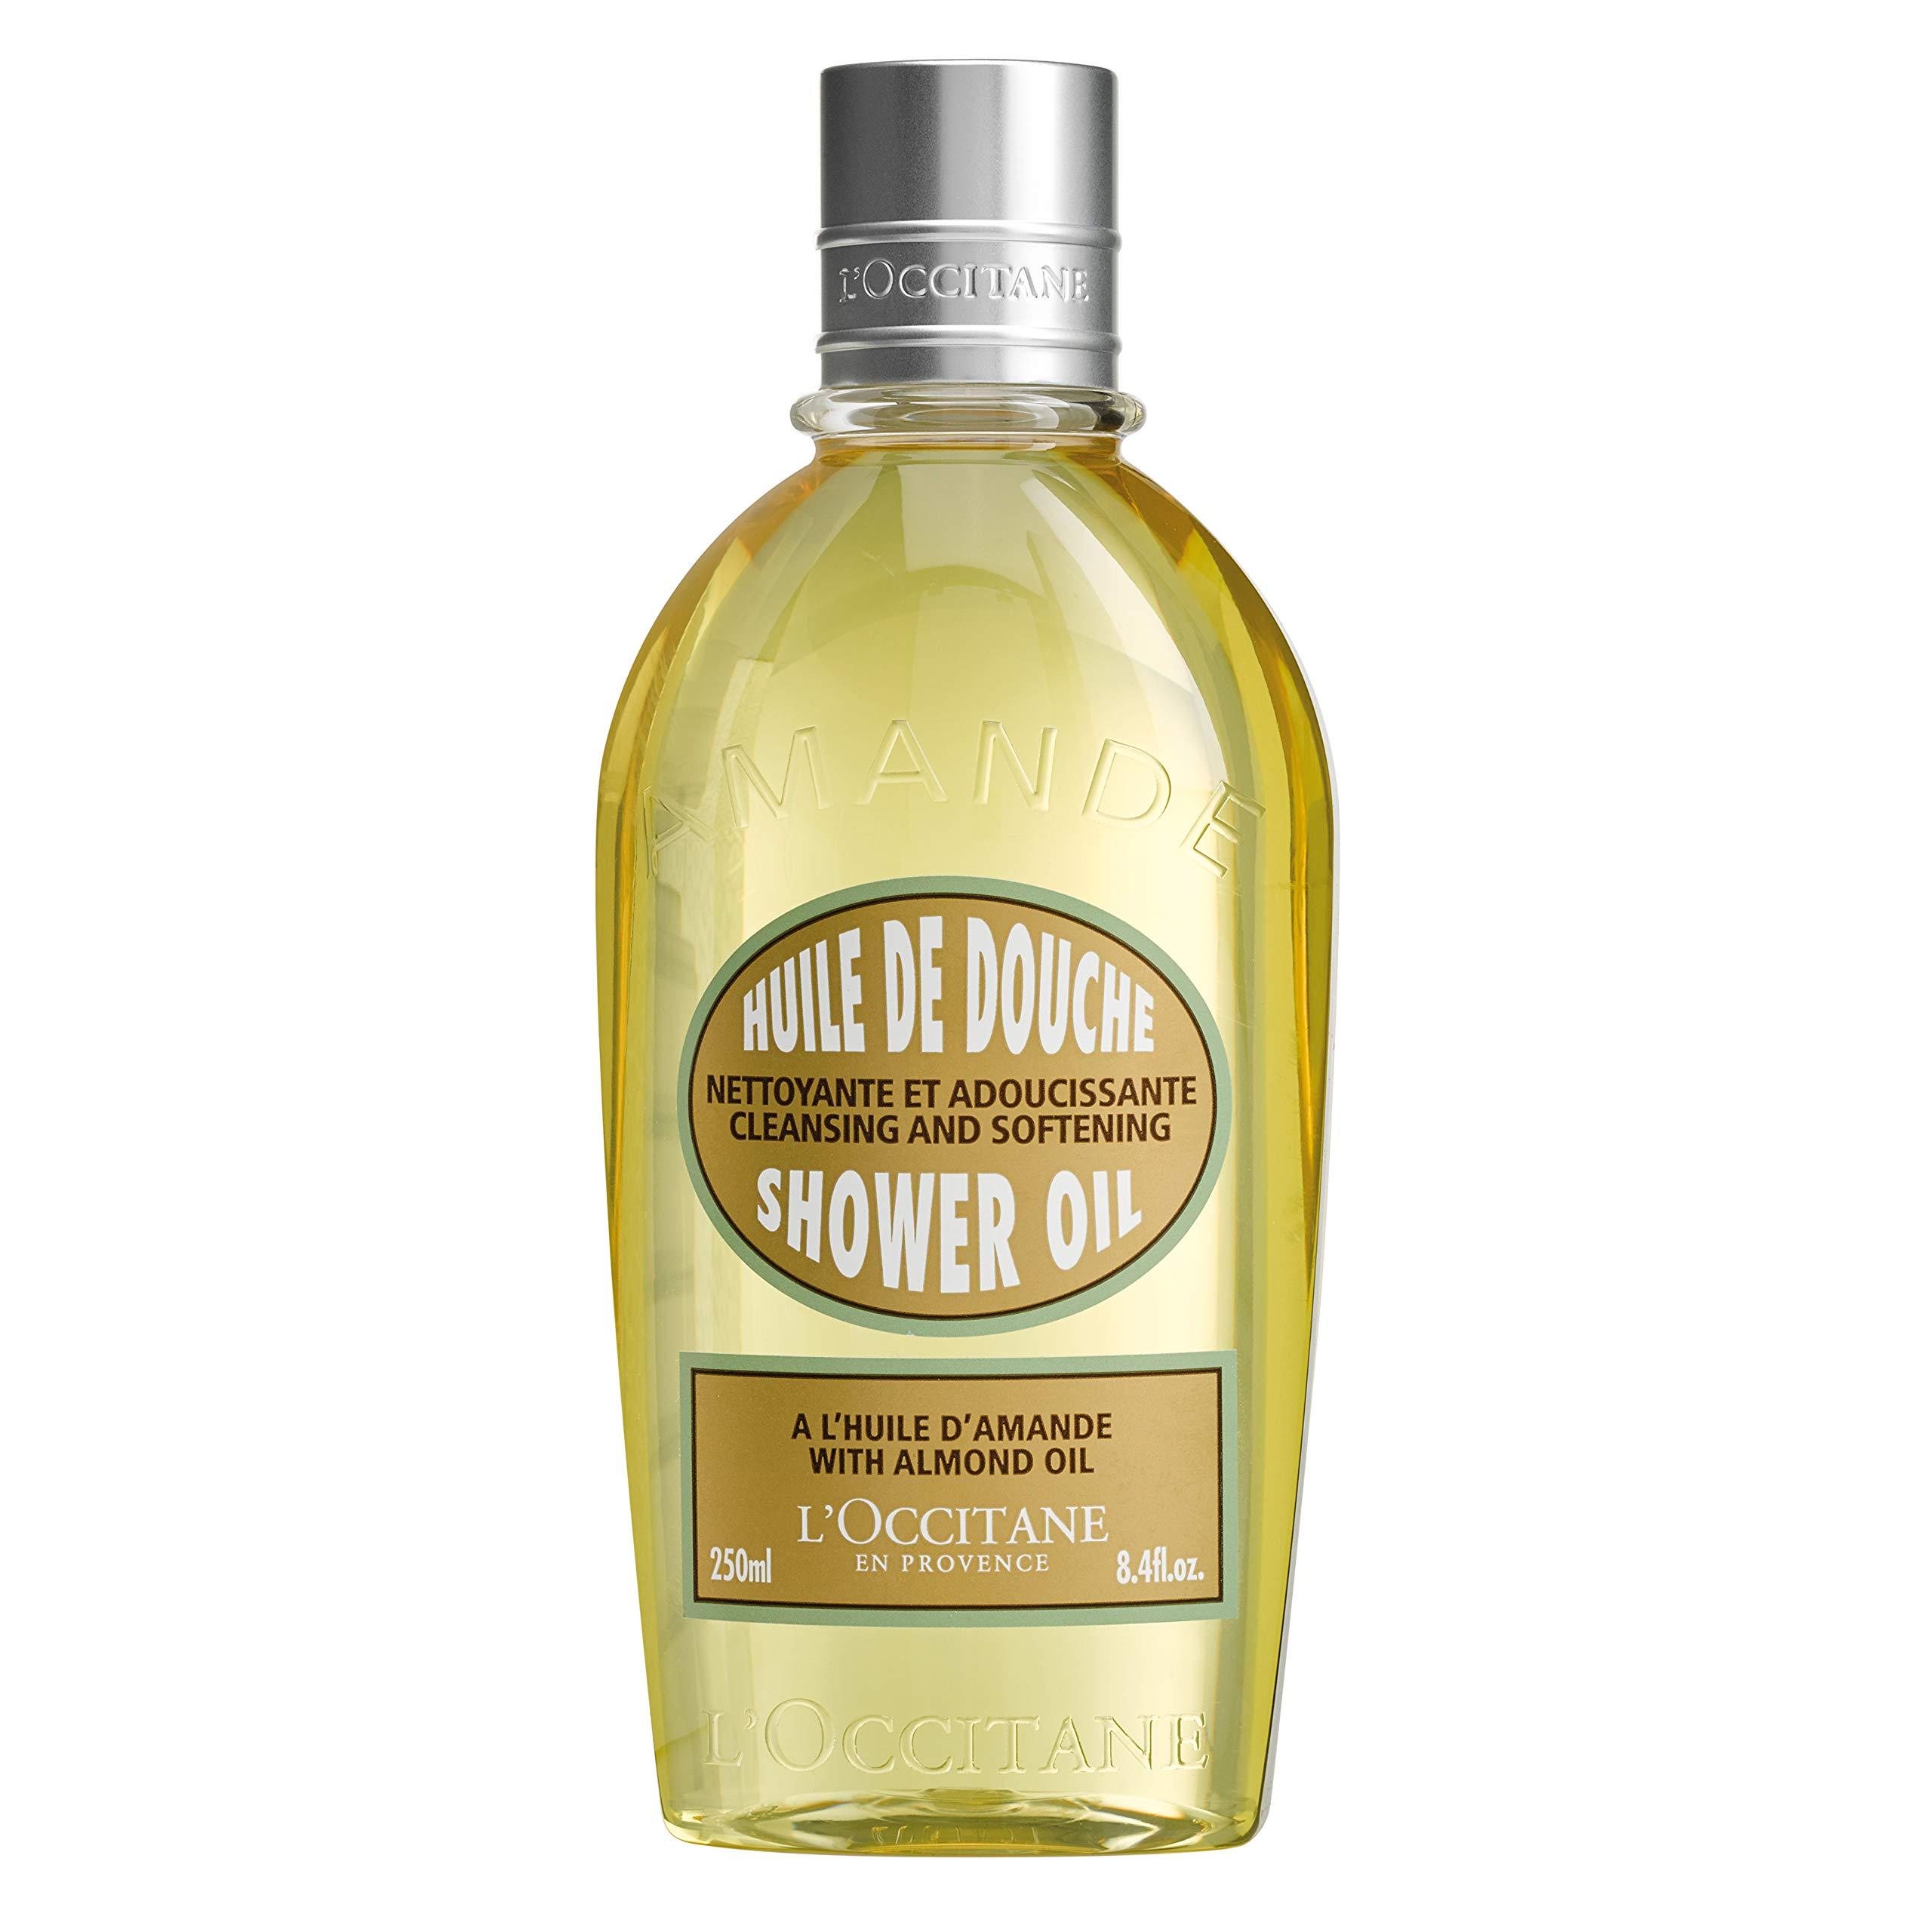 L'Occitane Cleansing & Softening Almond Shower Oil, 8.4 fl. oz. by L'Occitane